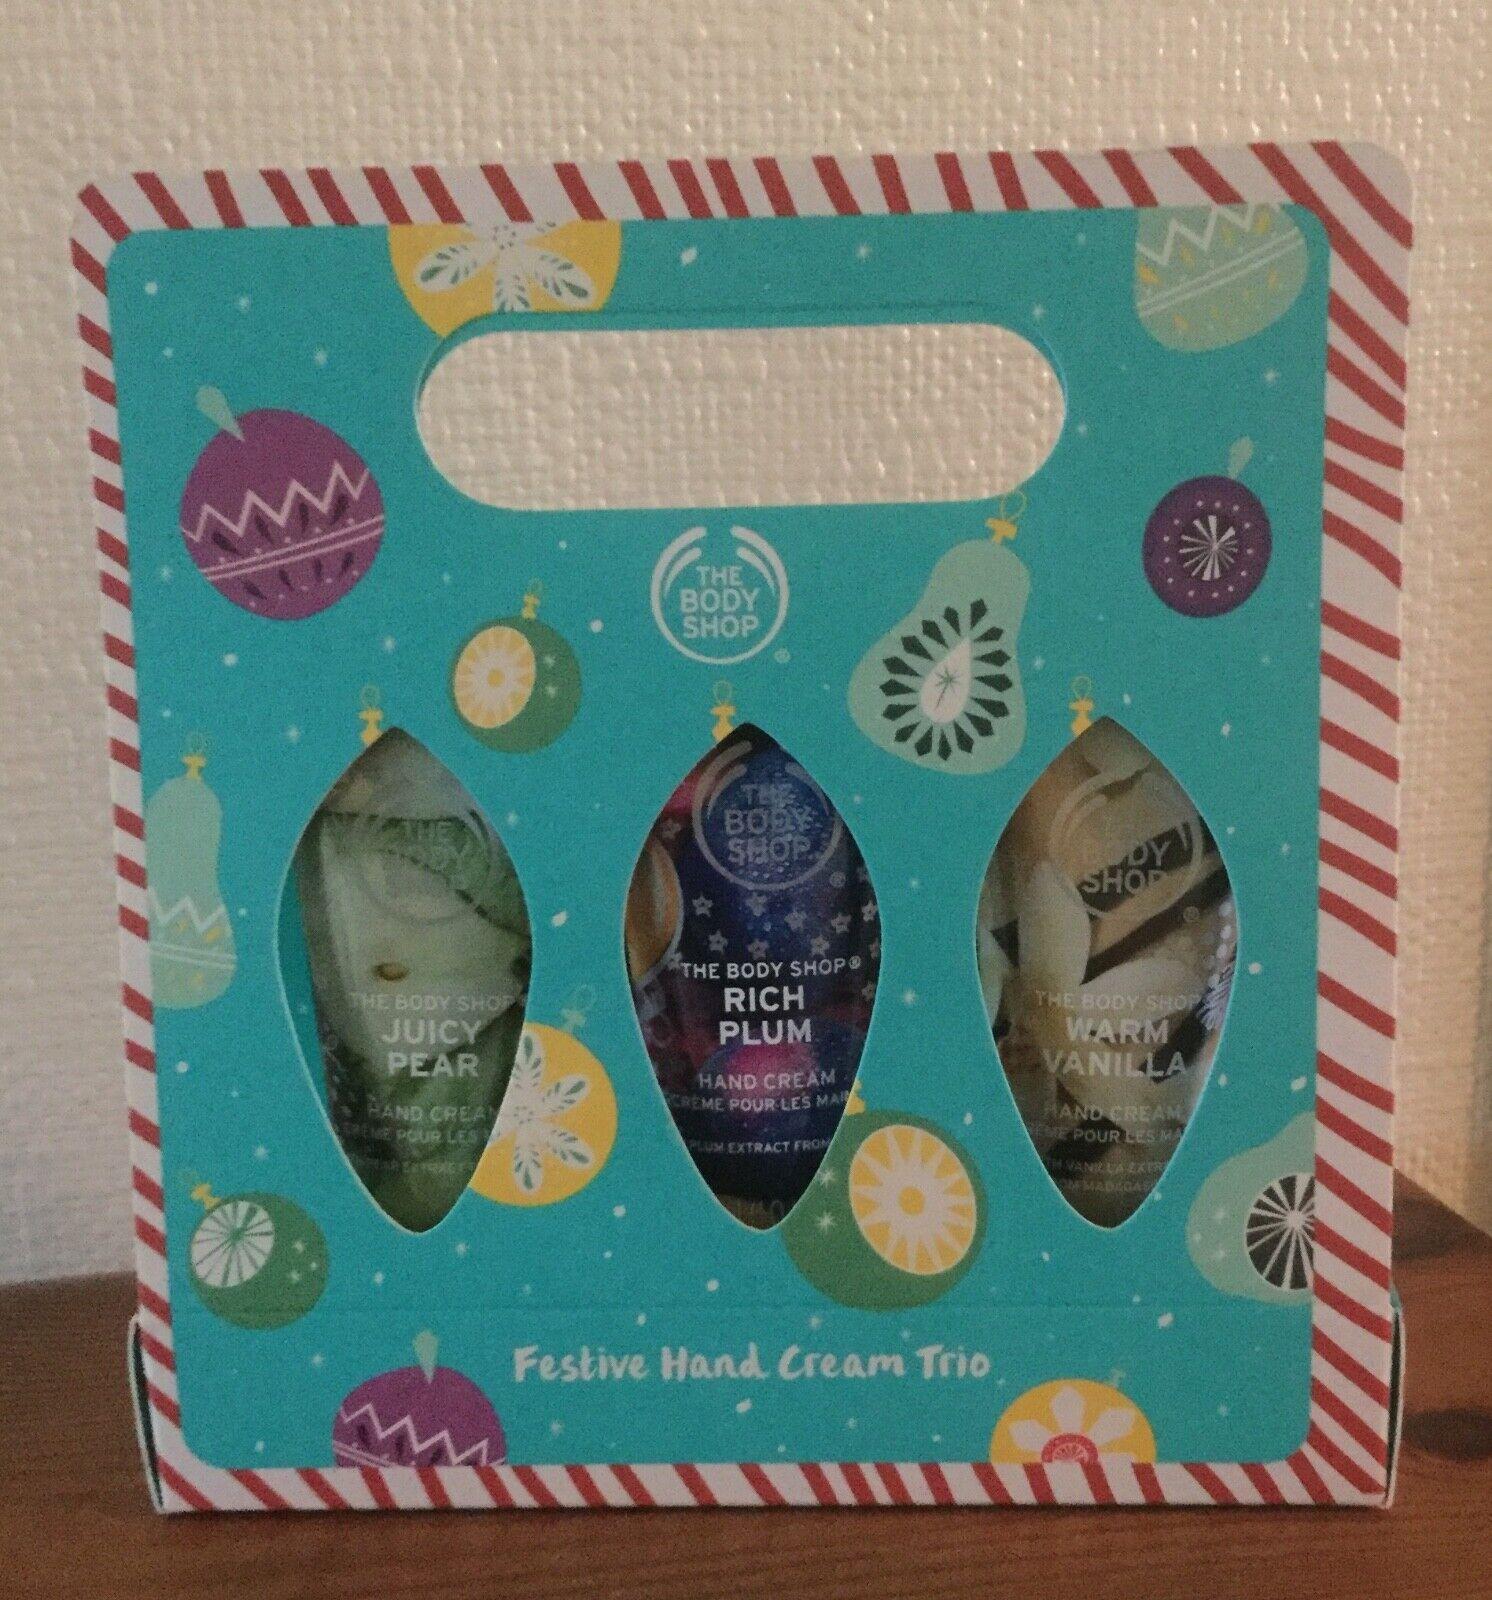 The Body Shop Festive Hand Cream Trio Gift Set